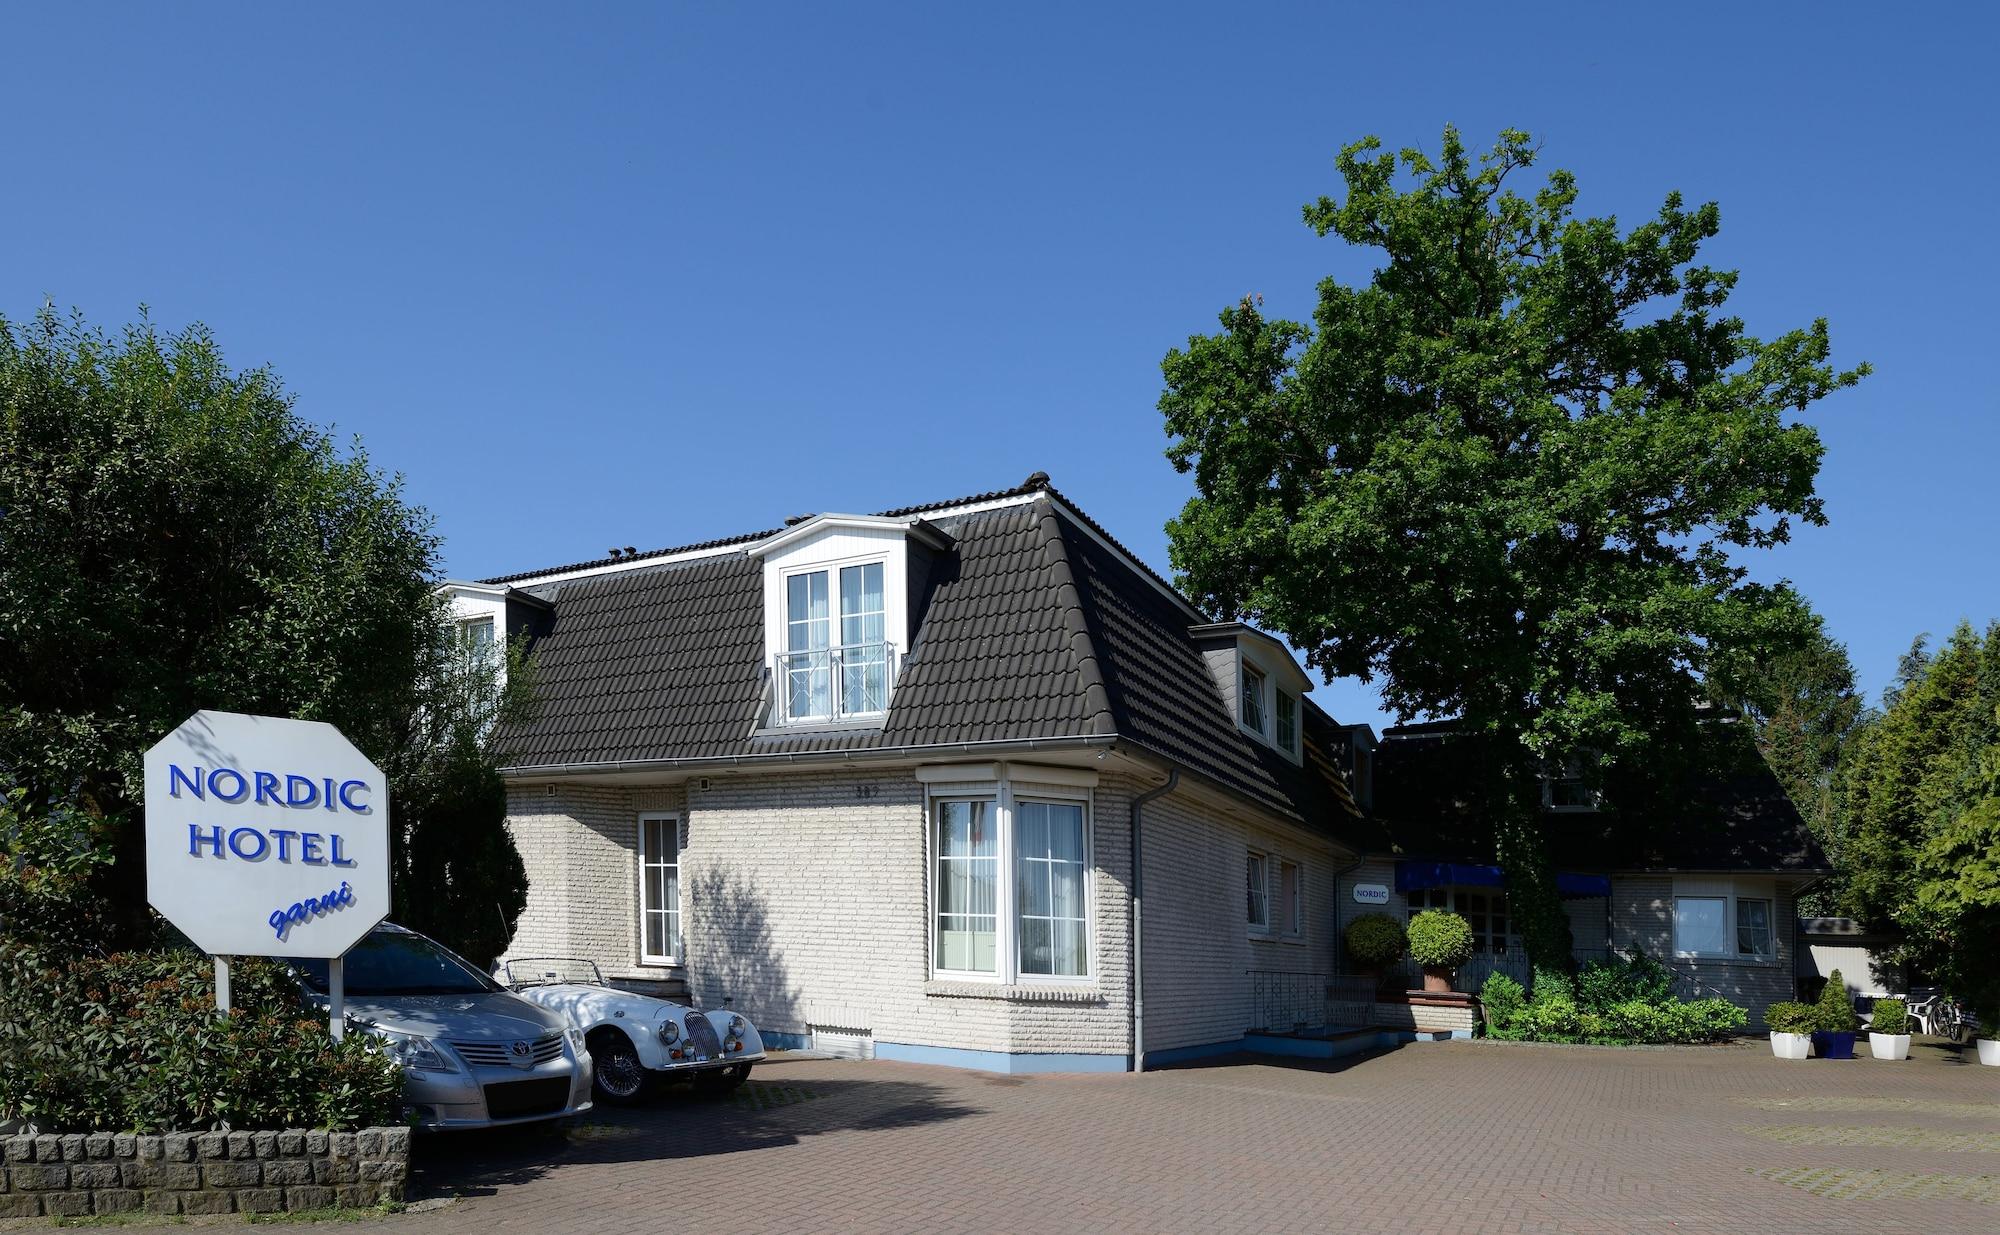 Hotel Nordic, Segeberg